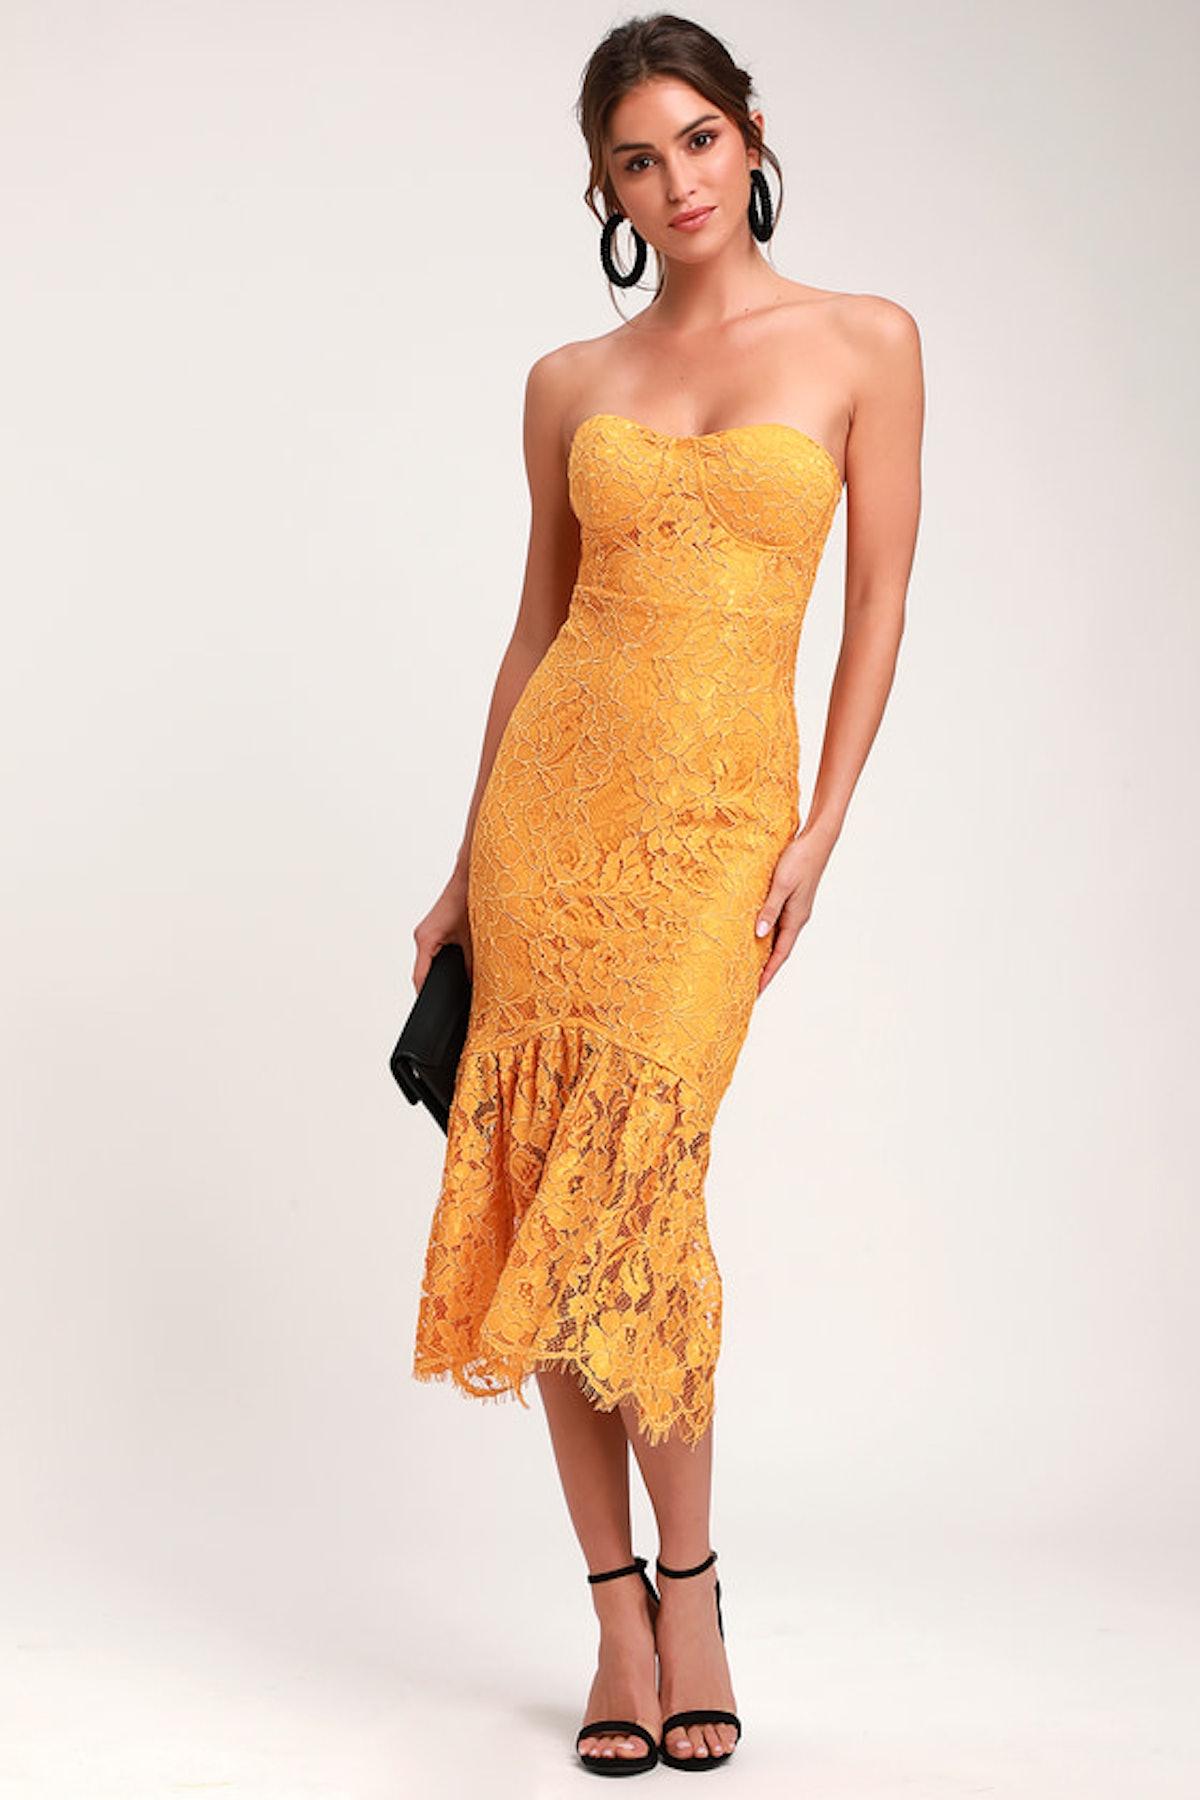 Divine Nights Golden Yellow Lace Strapless Midi Dress